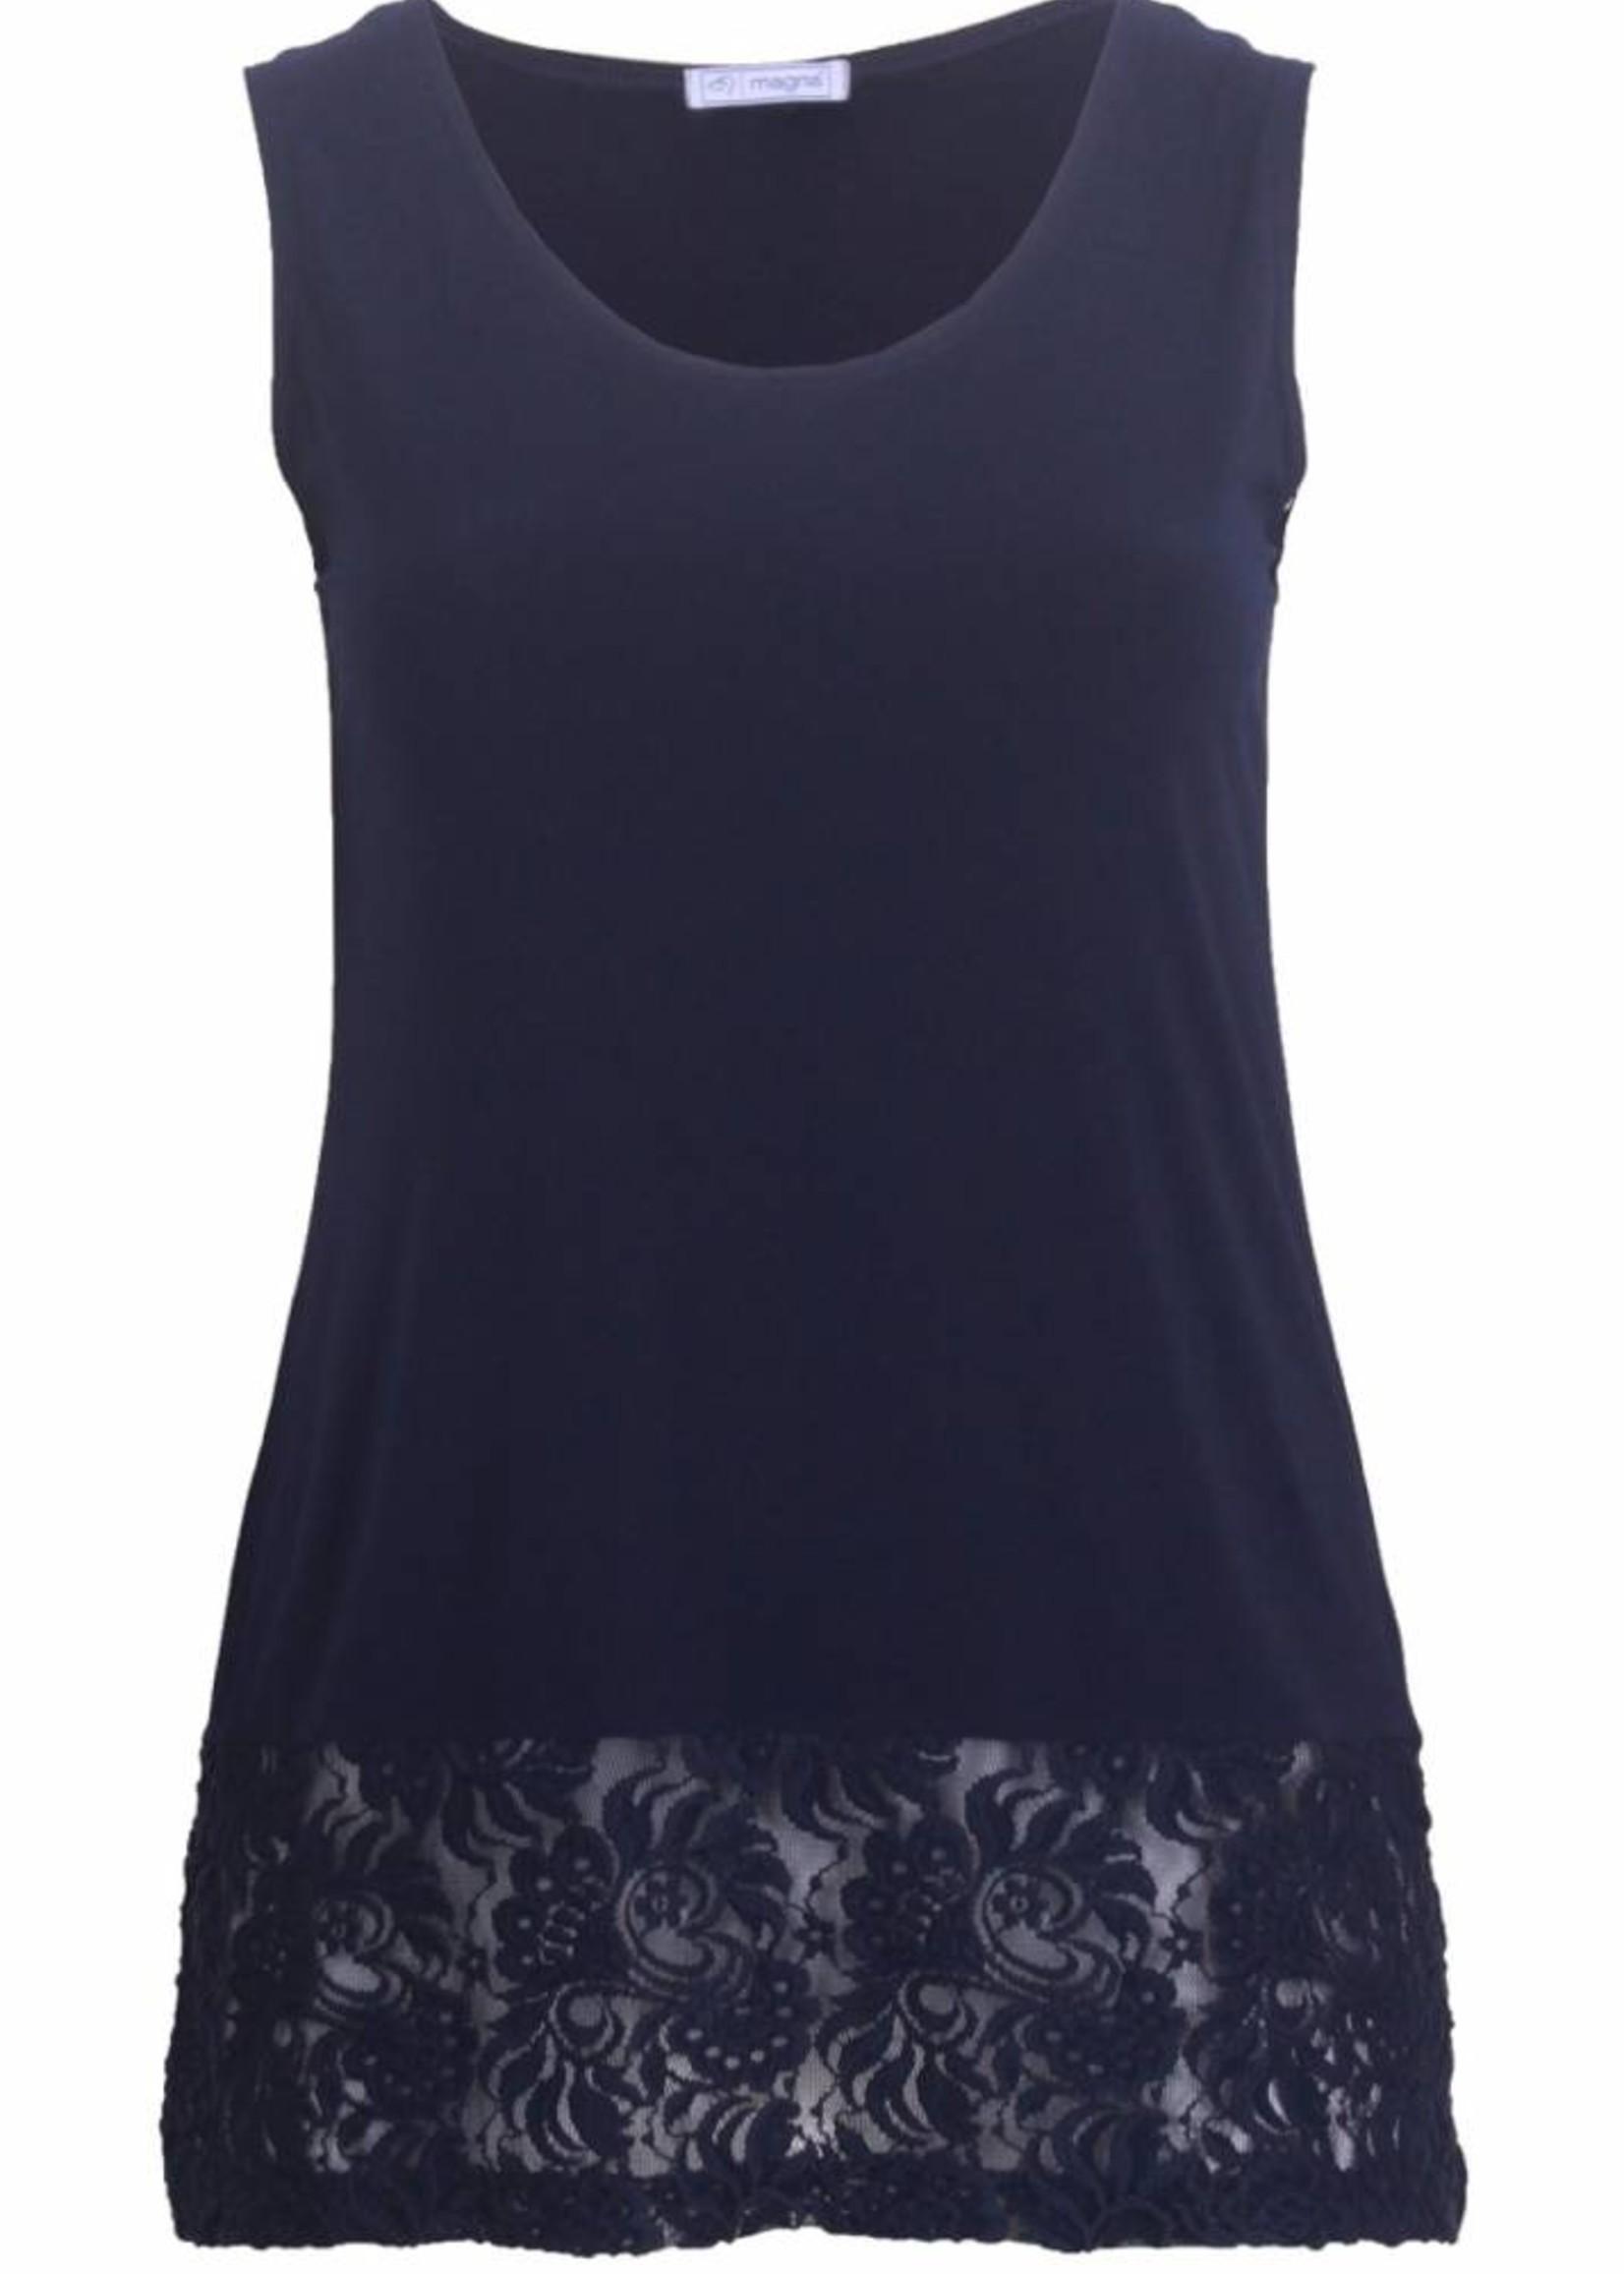 Magna Fashion Top A83 SOLID BASIS